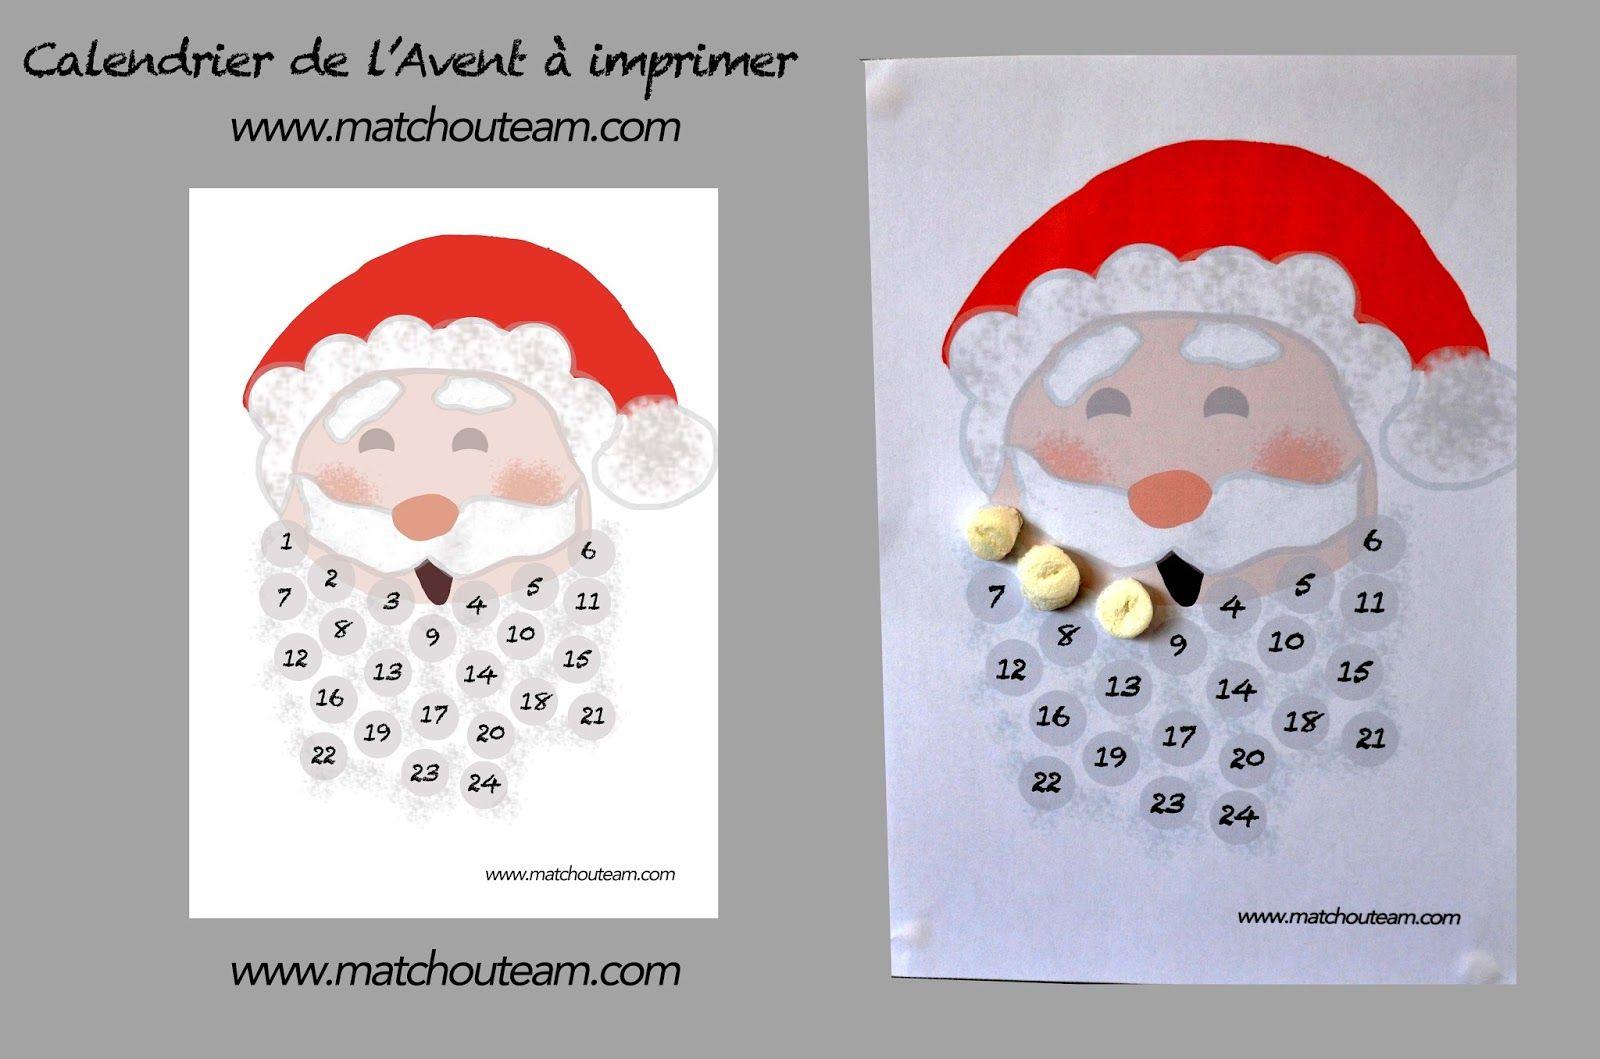 Calendrier De L Avent Histoire.Calendrier De L Avent A Imprimer Calendrier De L Avent